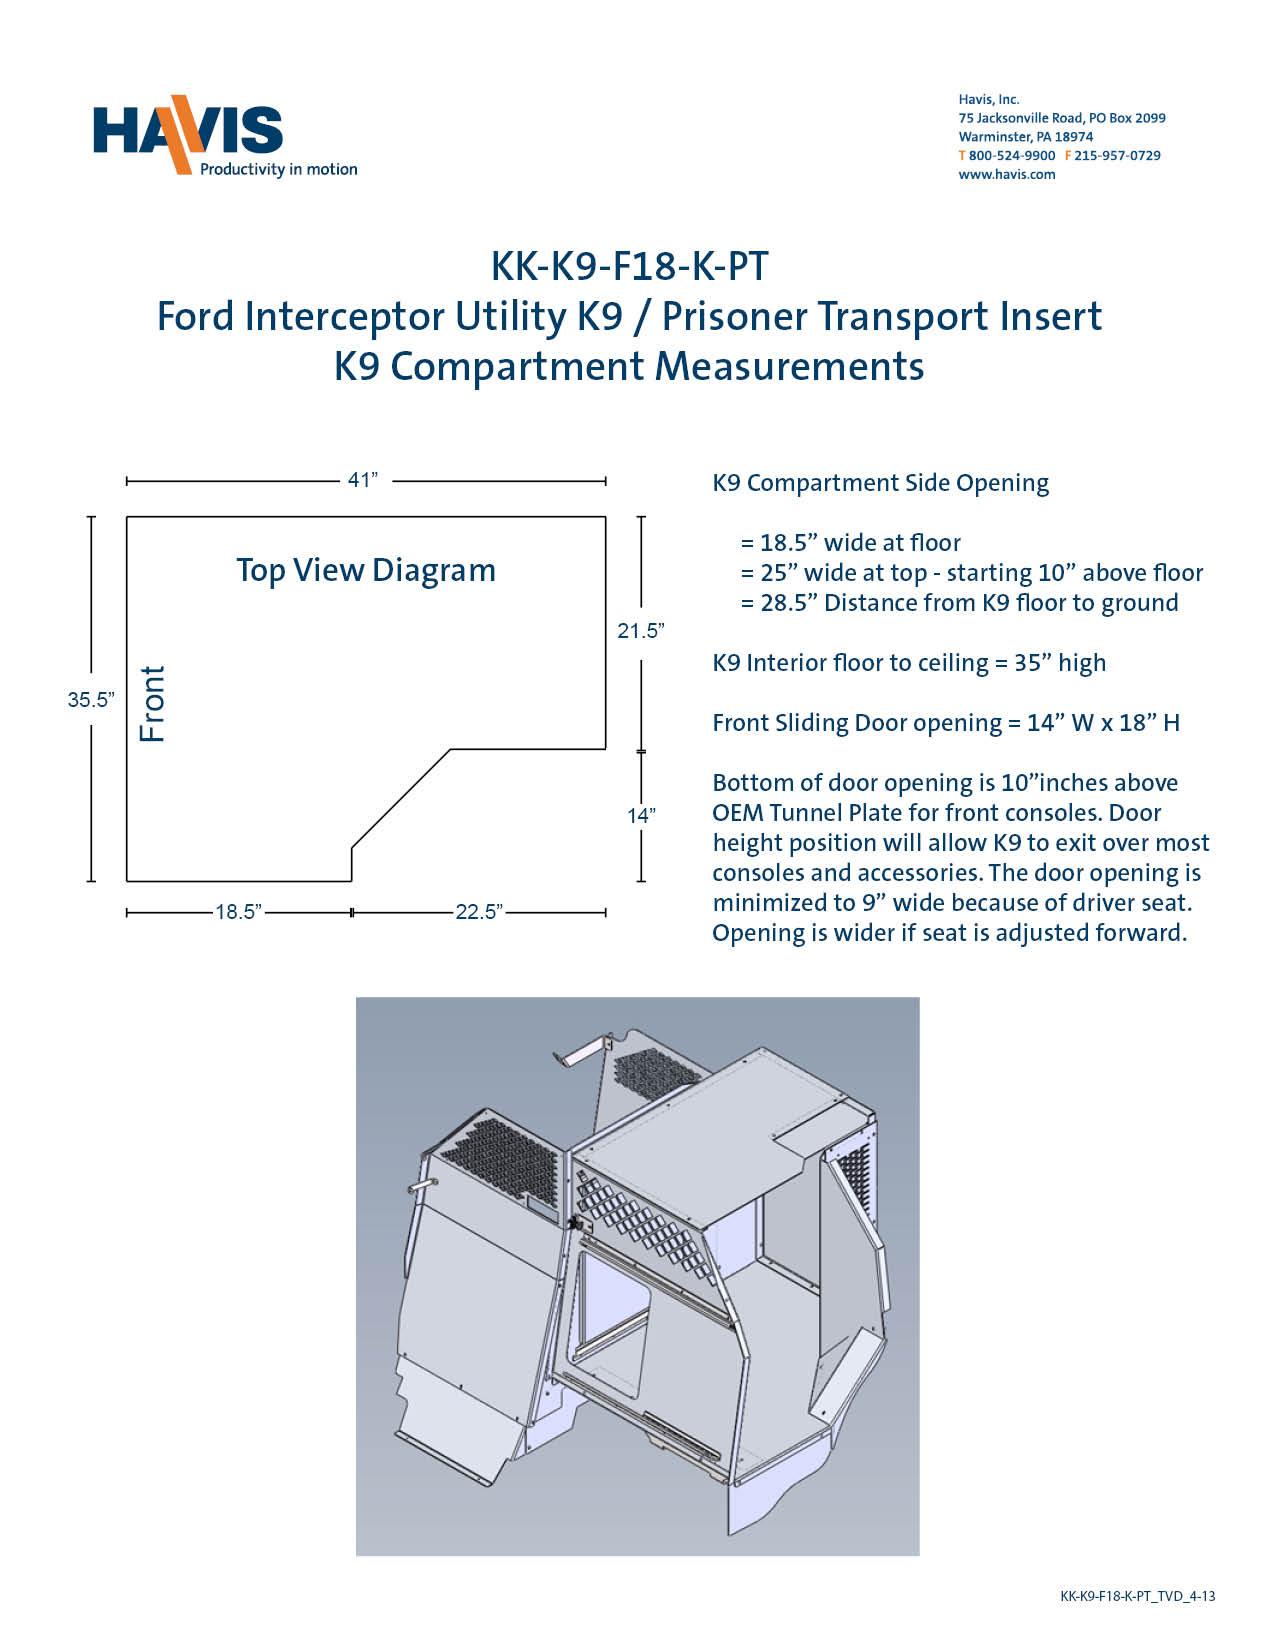 DIAGRAM] Wiring Diagram Interceptor Suv FULL Version HD Quality Interceptor  Suv - IT-DIAGRAM.INK3.ITInk3